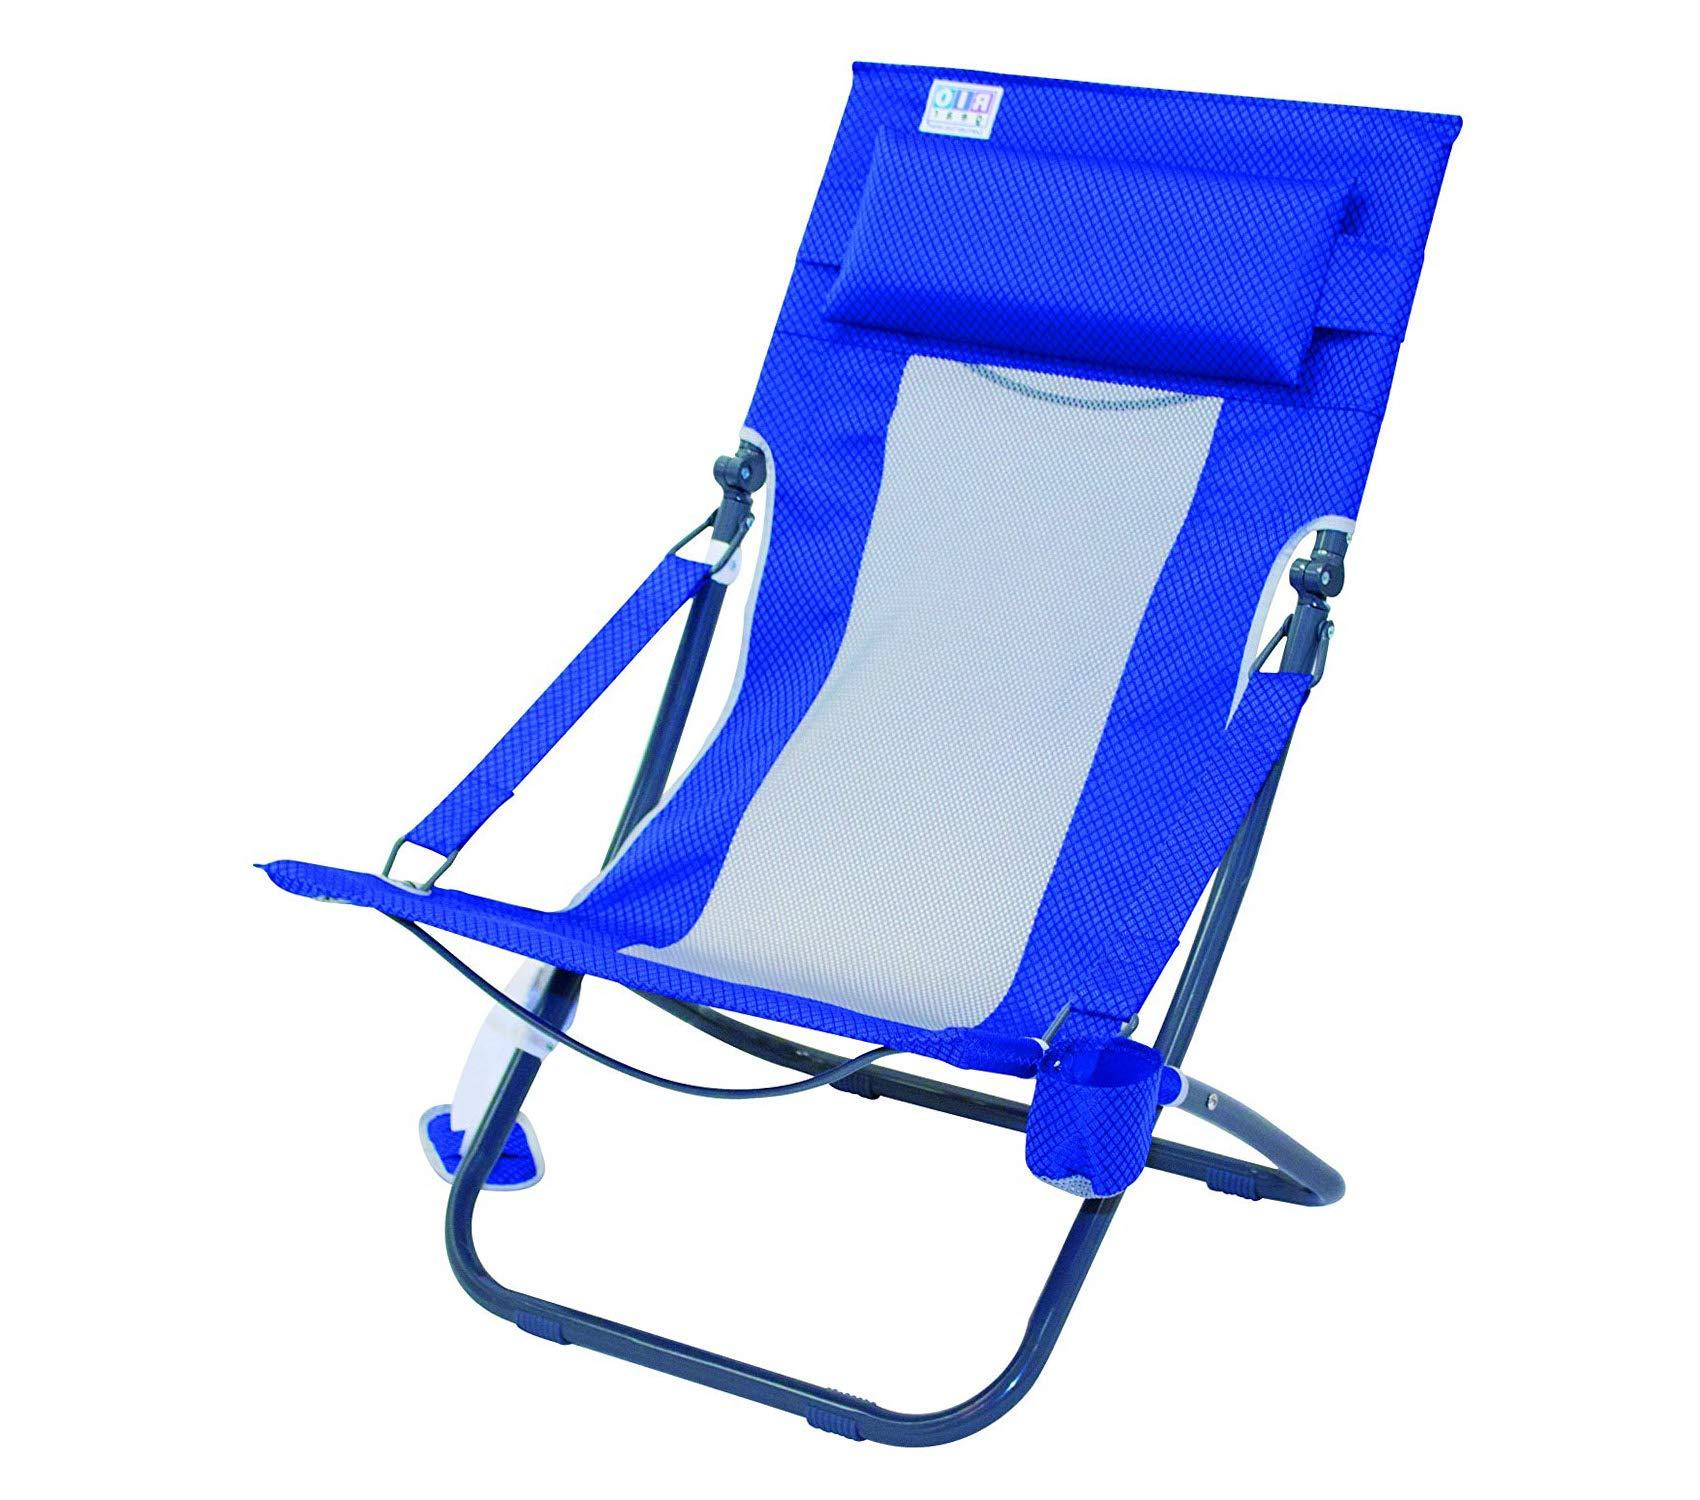 Wood & Style Patio Outdoor Garden Premium Rio Beach Portable Compact Fold Breeze Beach Sling Chair, Blue Textured